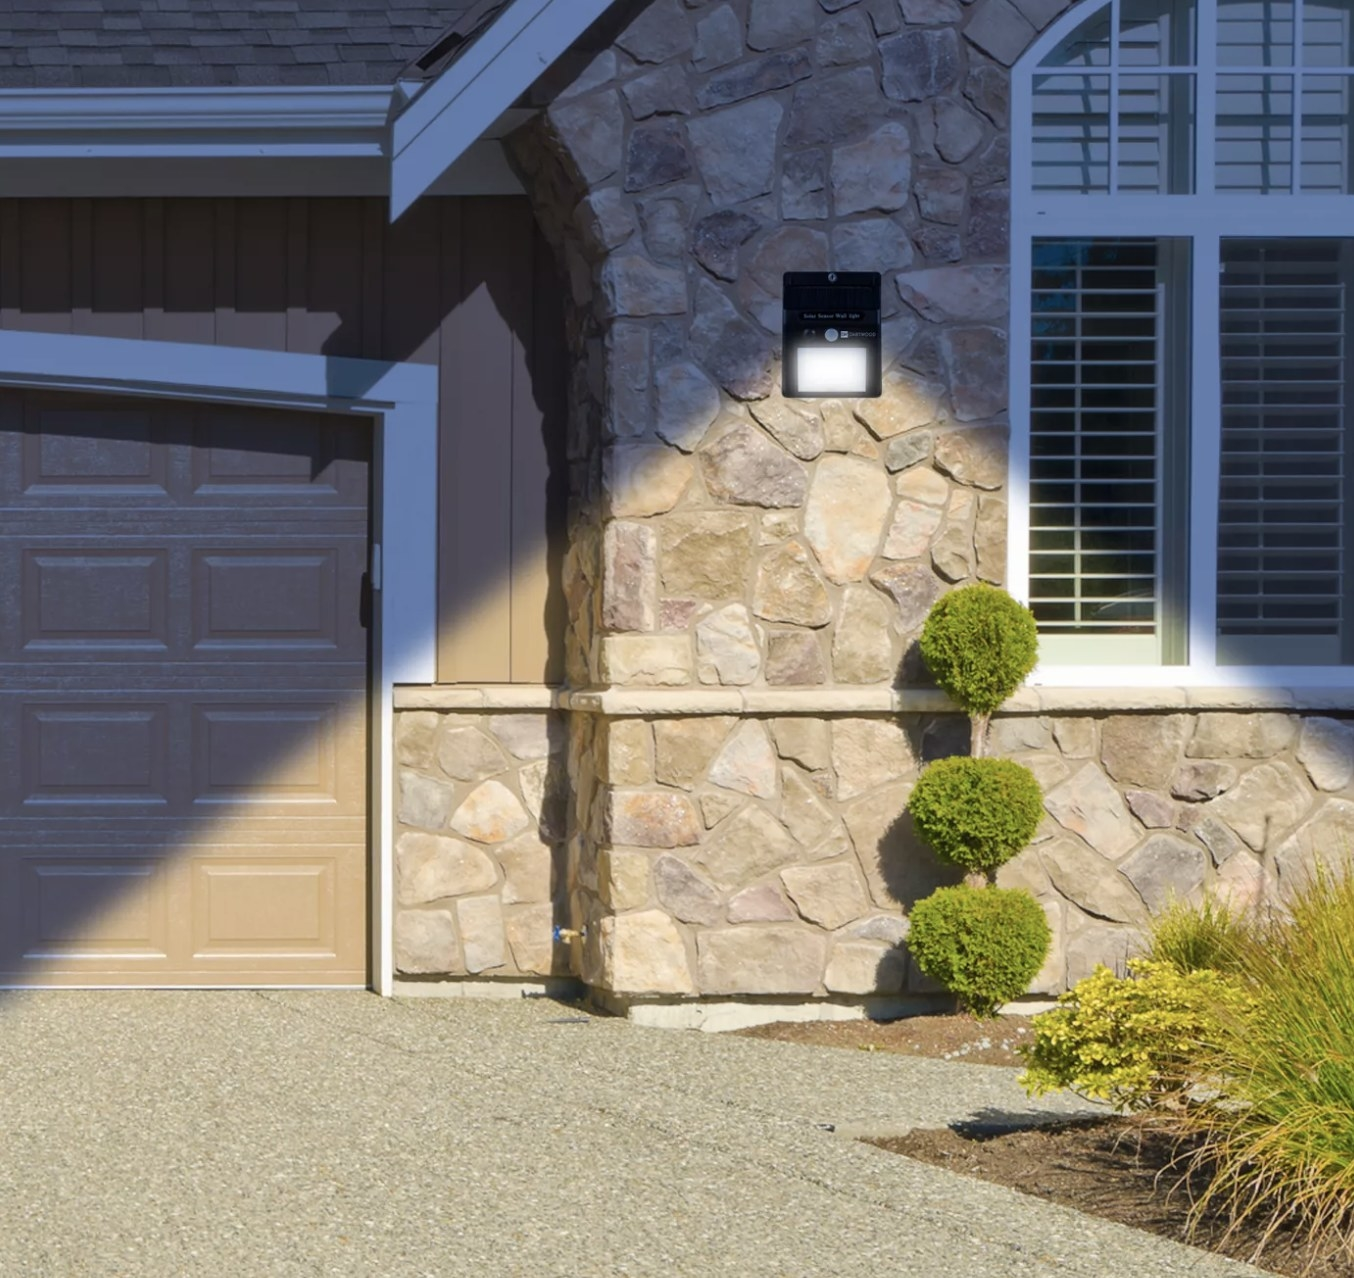 The motion sensor light next to a garage door